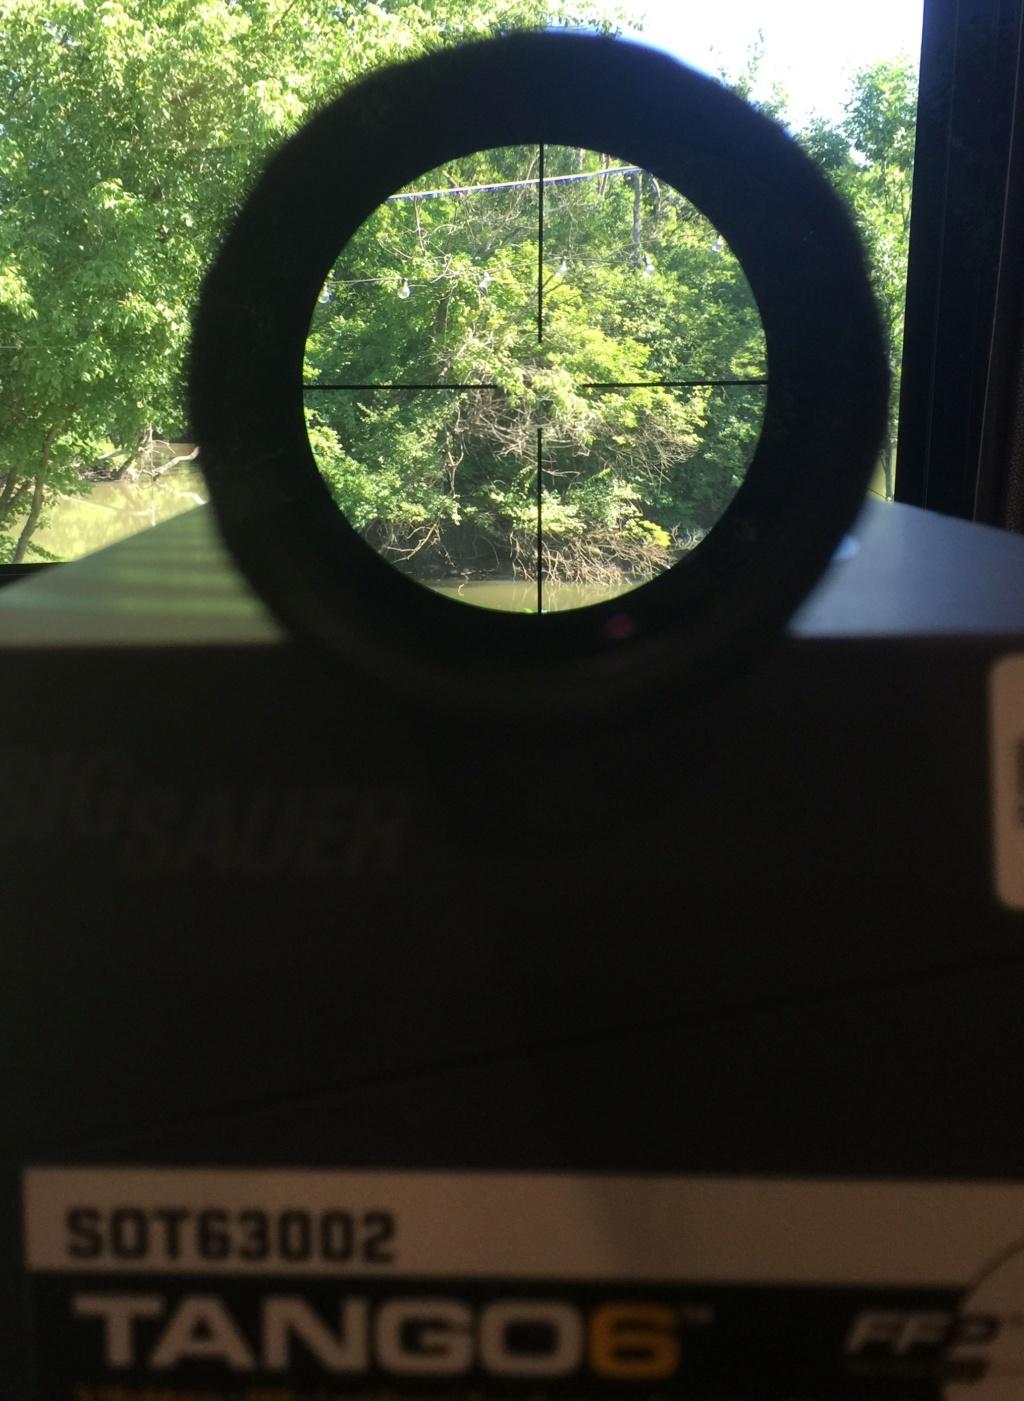 WTS:  Sig Sauer TANGO6 3-18x44mm FFP Scope Tango614